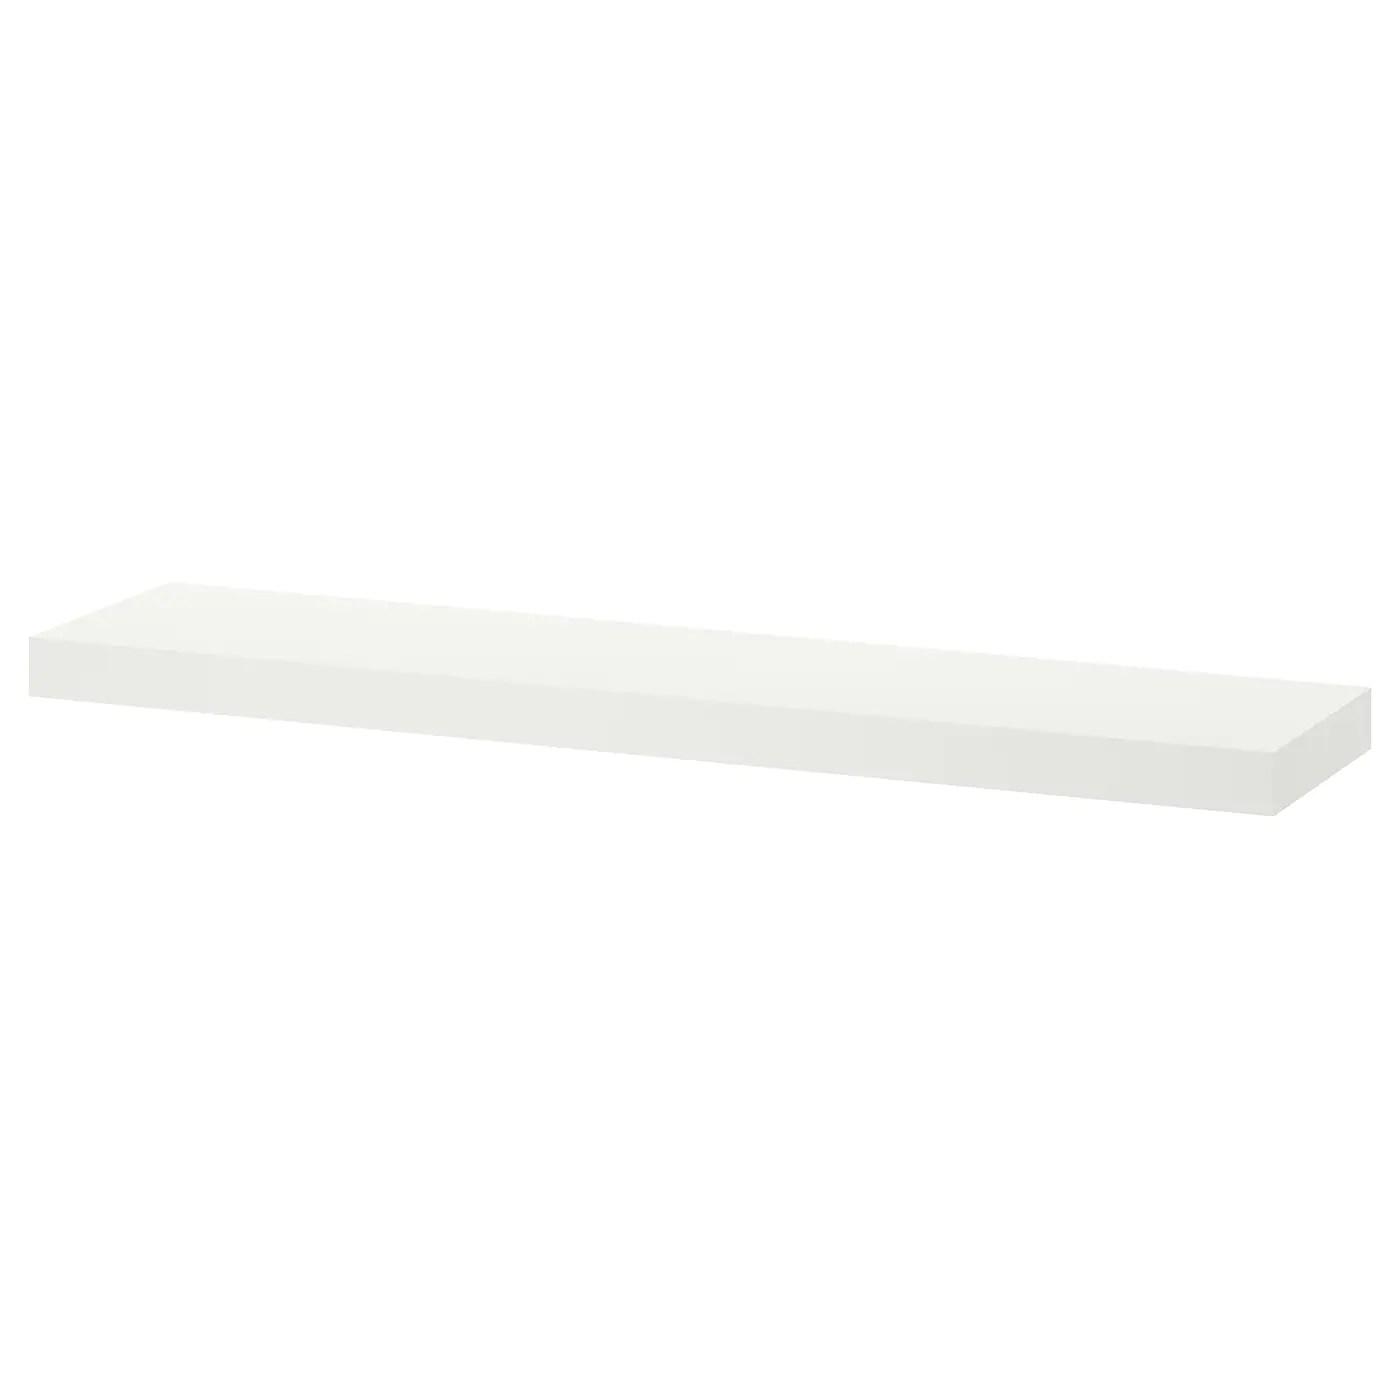 Lack Hylde Hvid 110x26 Cm Ikea